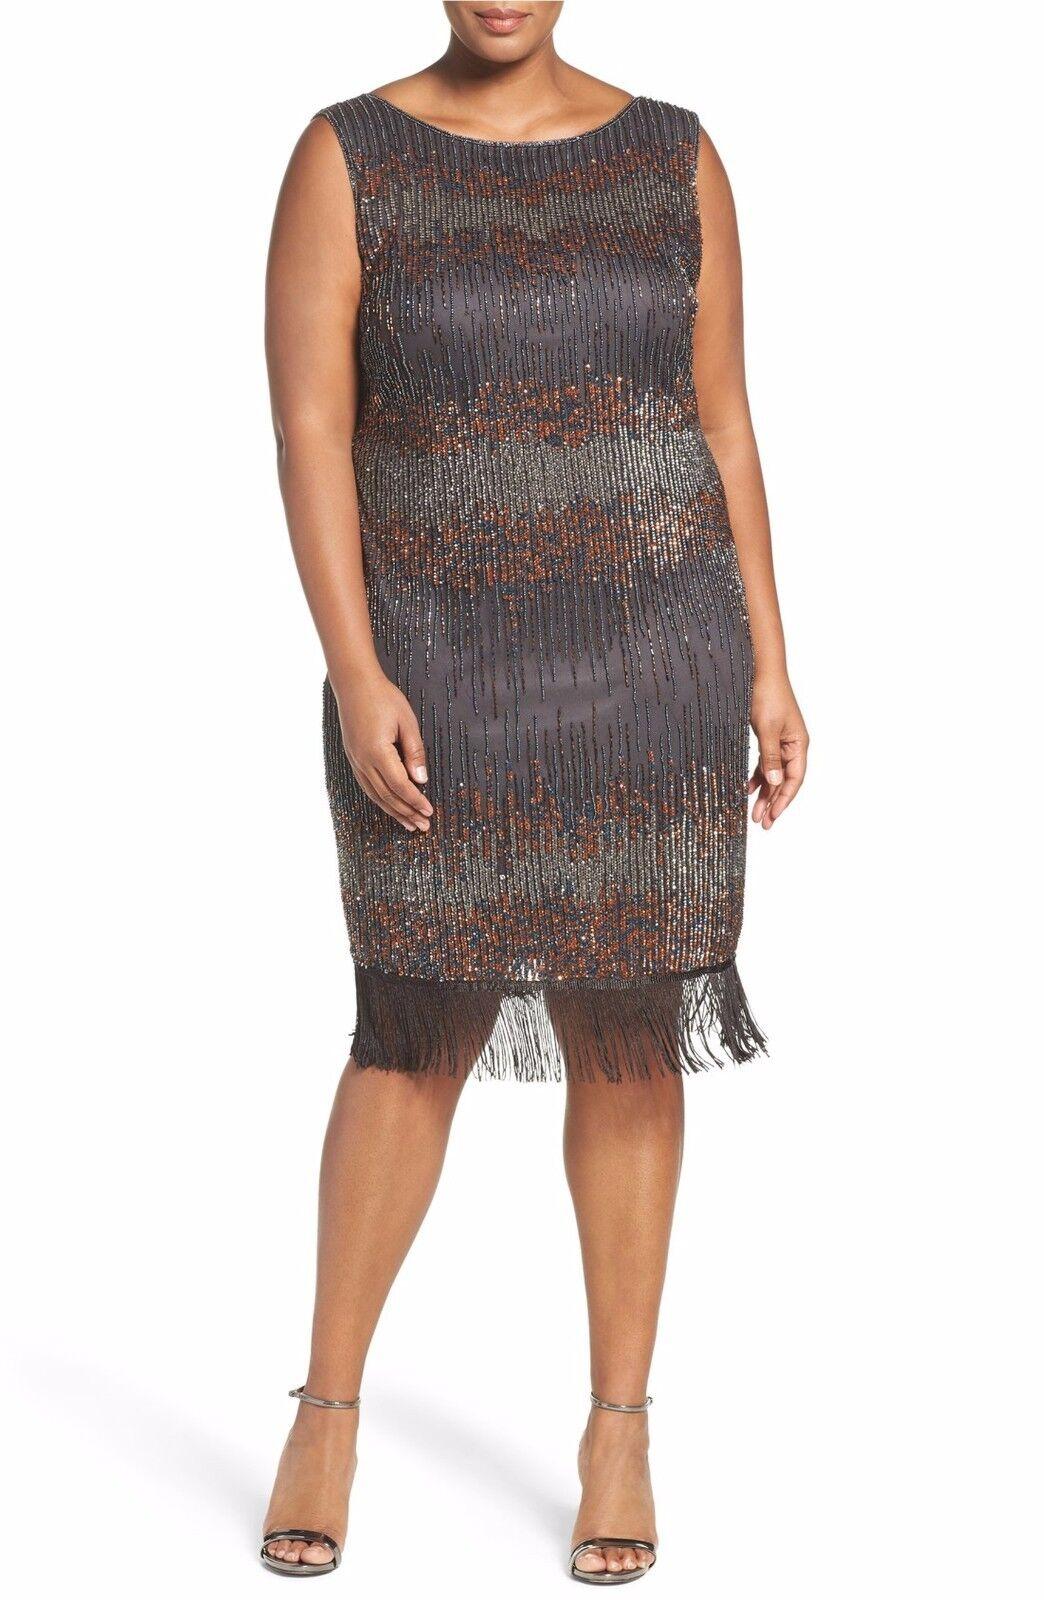 Pissaro Nights Embellished Sheath Dress (Plus Size) (size 18W)